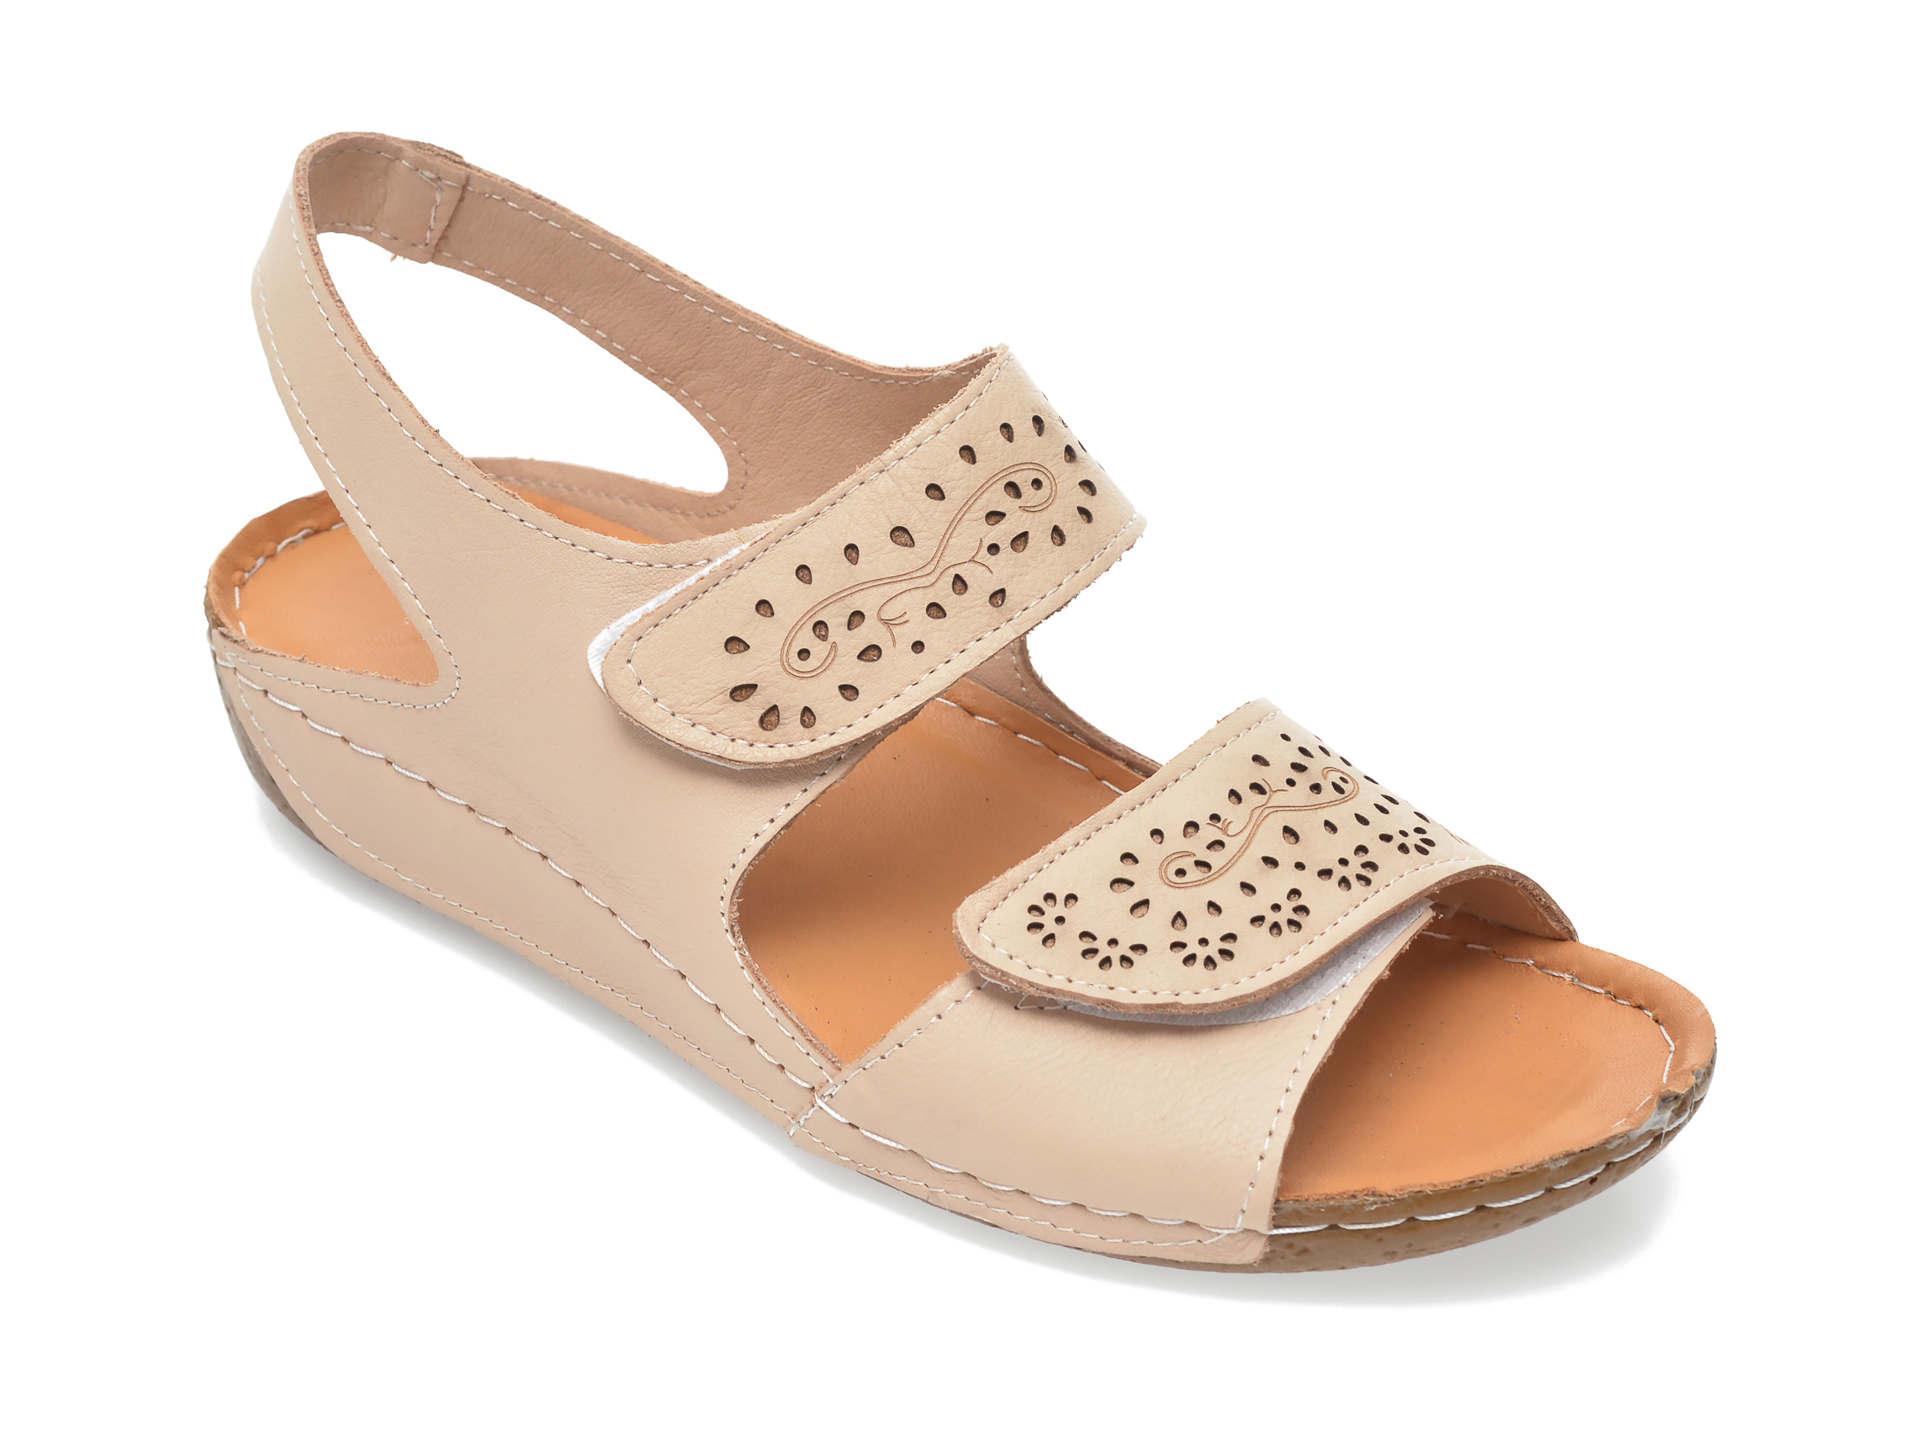 Sandale FLAVIA PASSINI bej 416, din piele naturala New